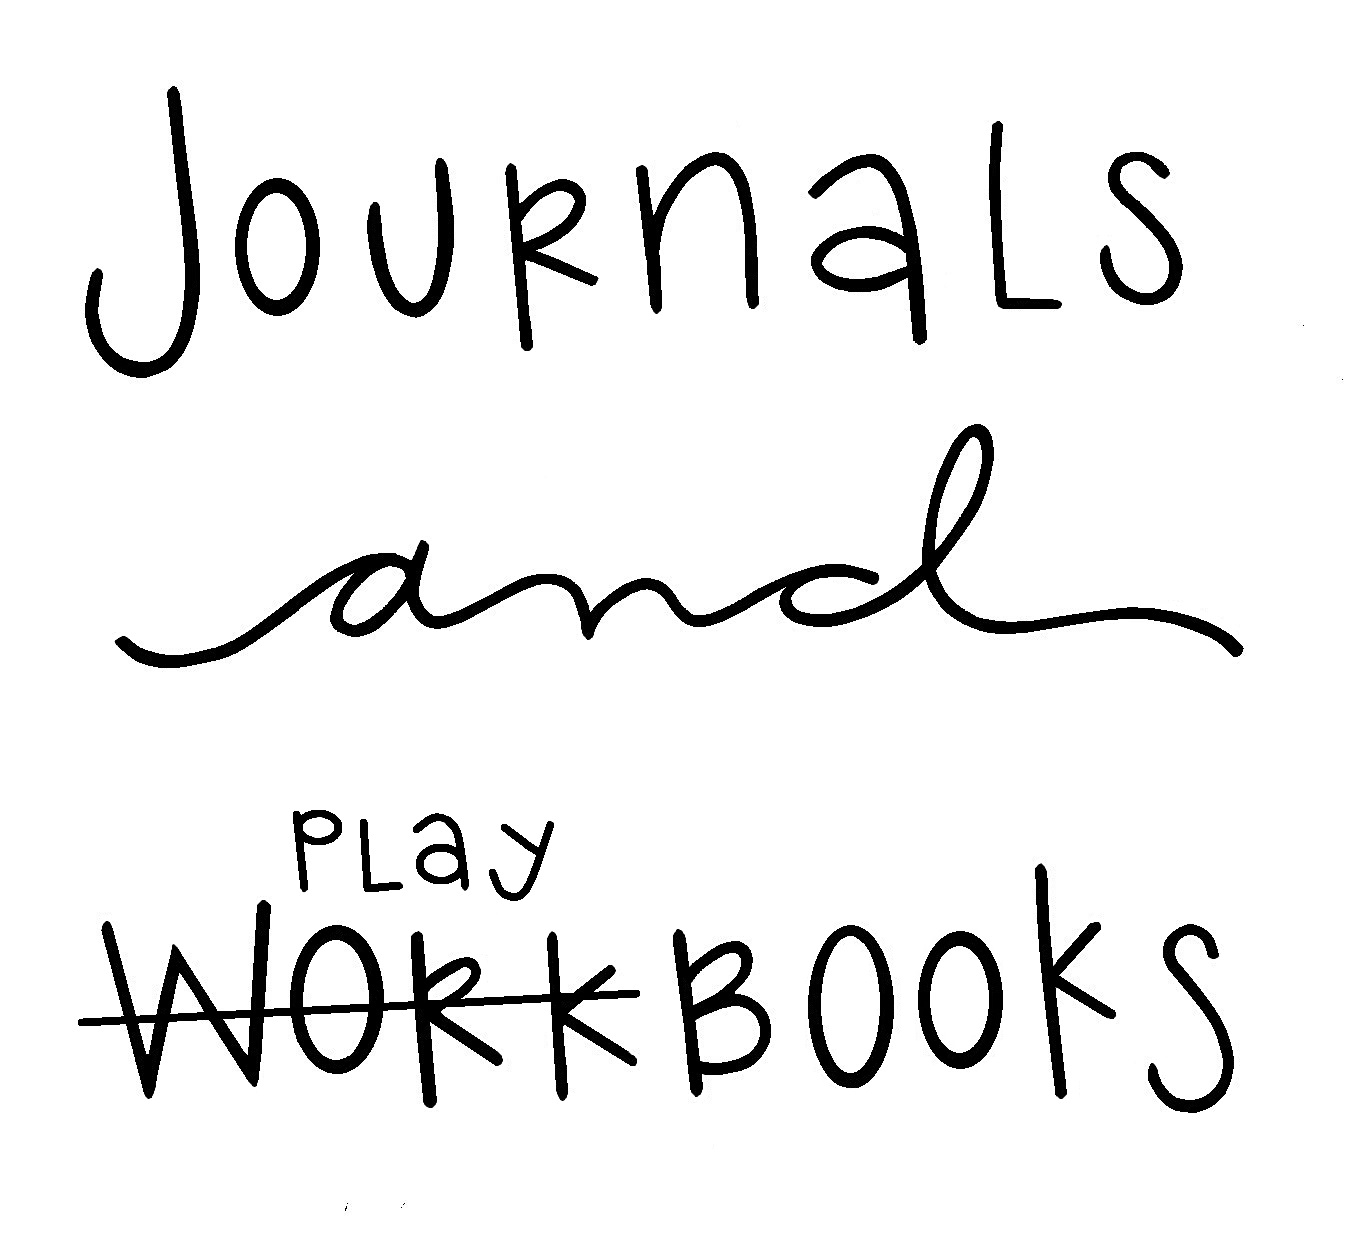 Journals and Workbooks 2.jpg